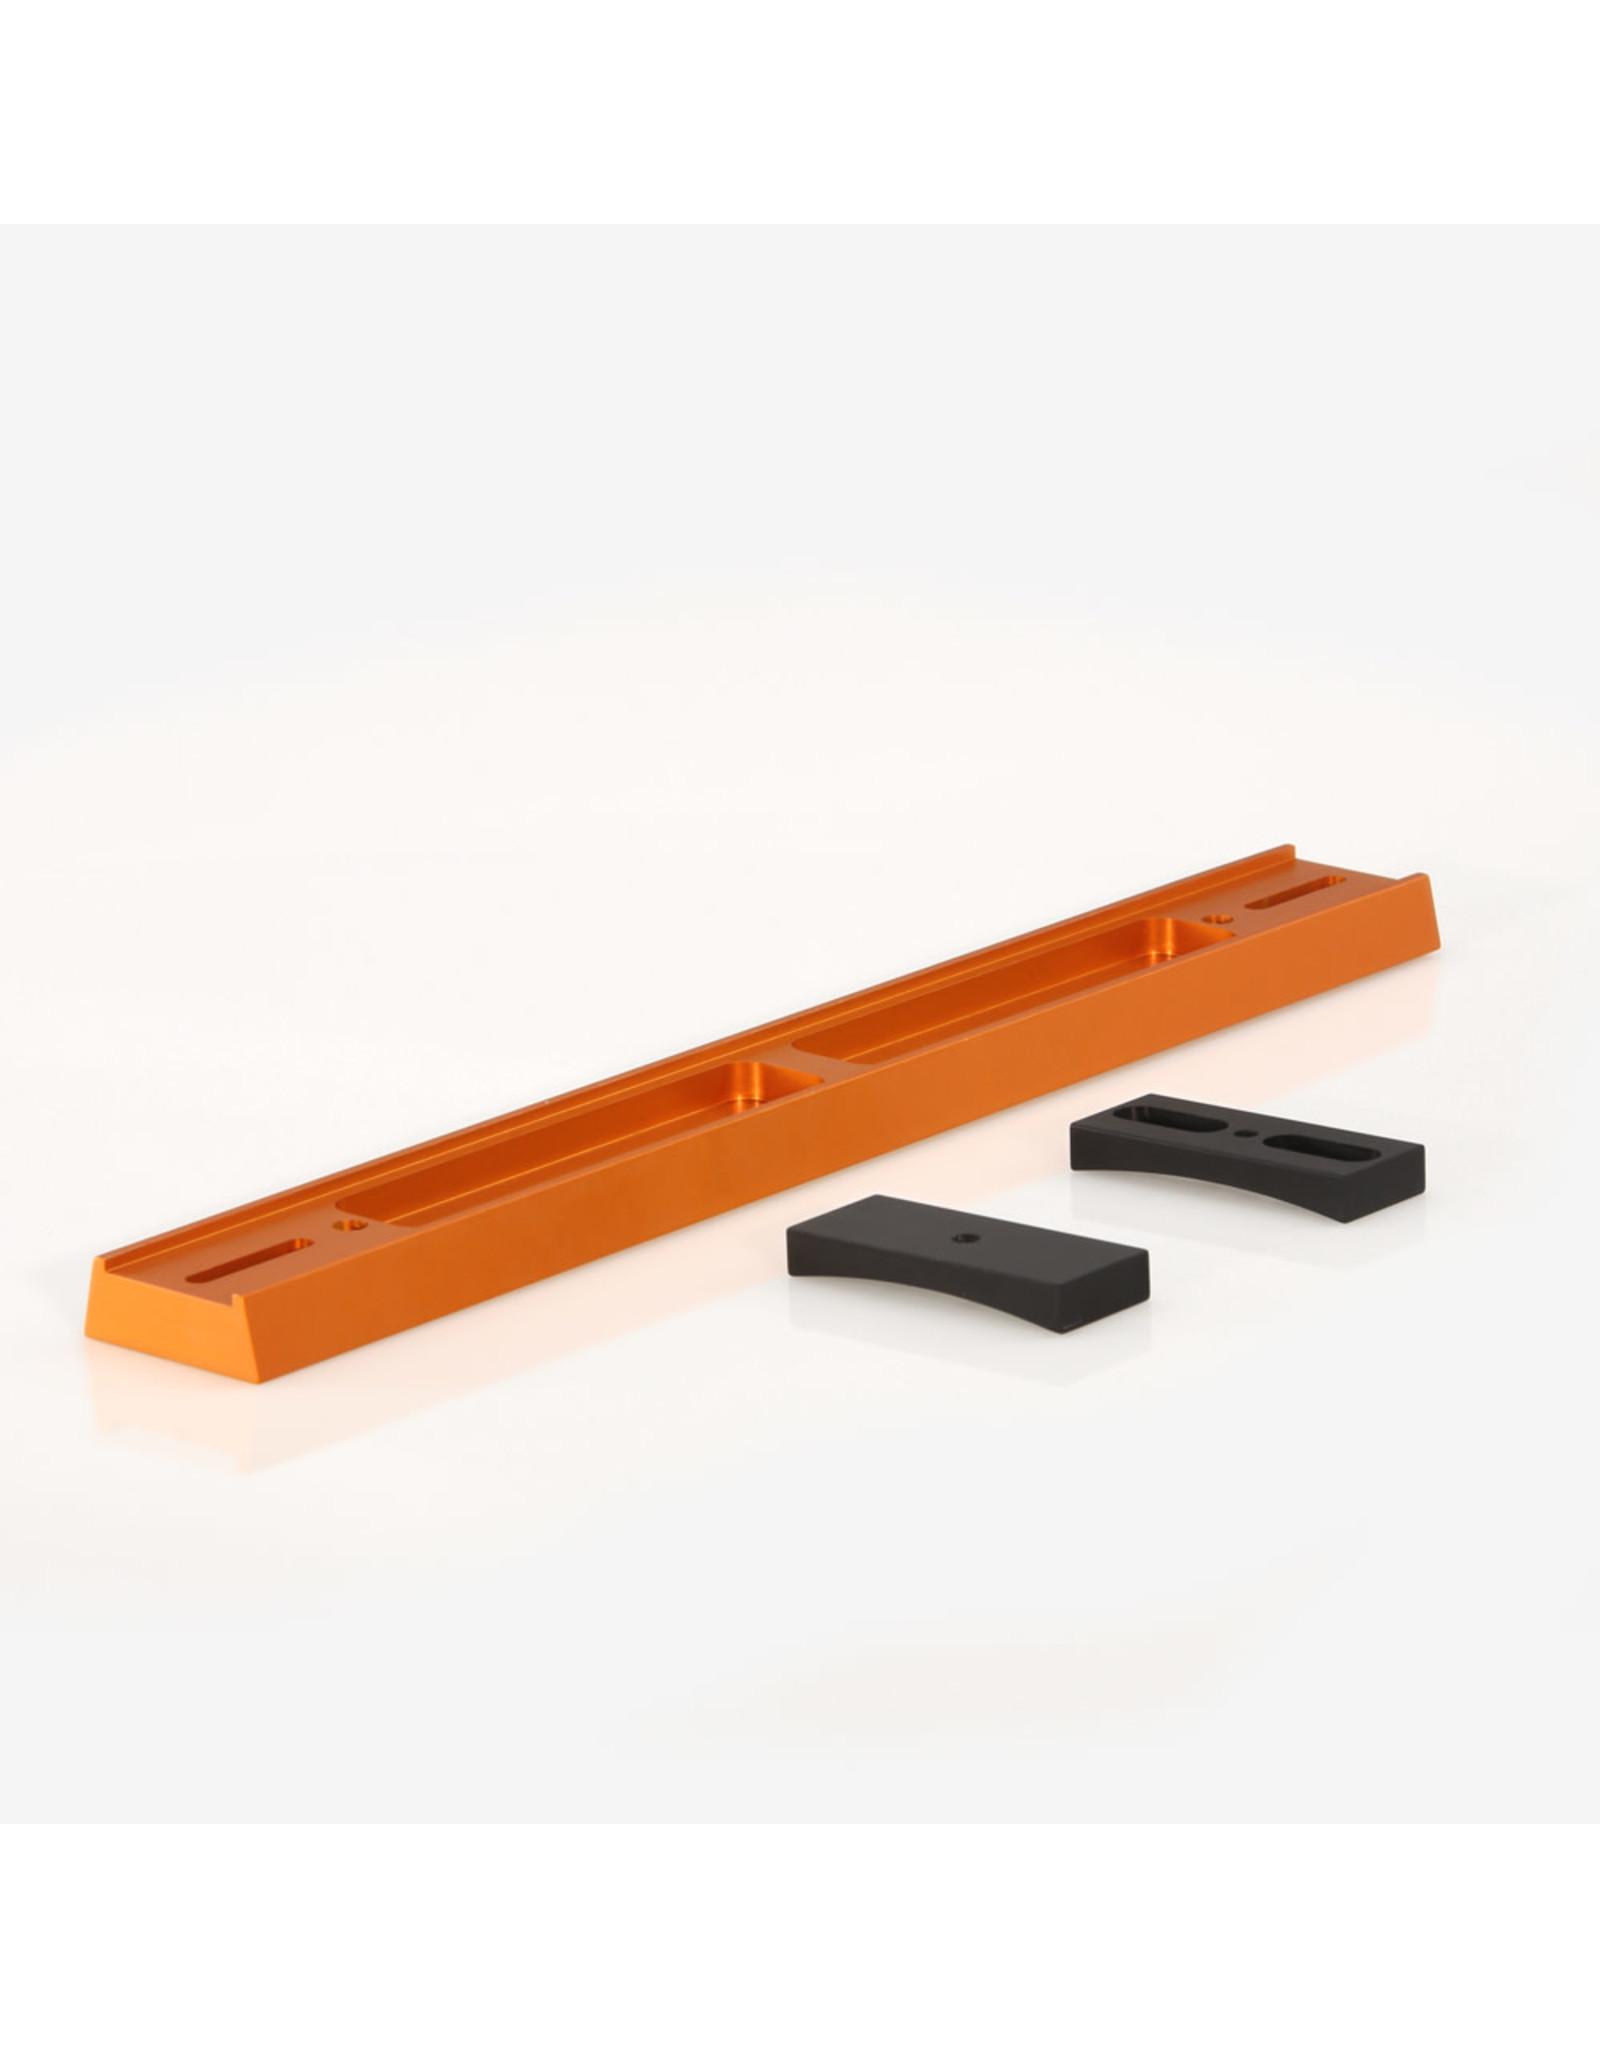 ADM ADM VC11-O- V Series Dovetail Bar for Celestron 11″ SCT Telescope. Orange Anodized